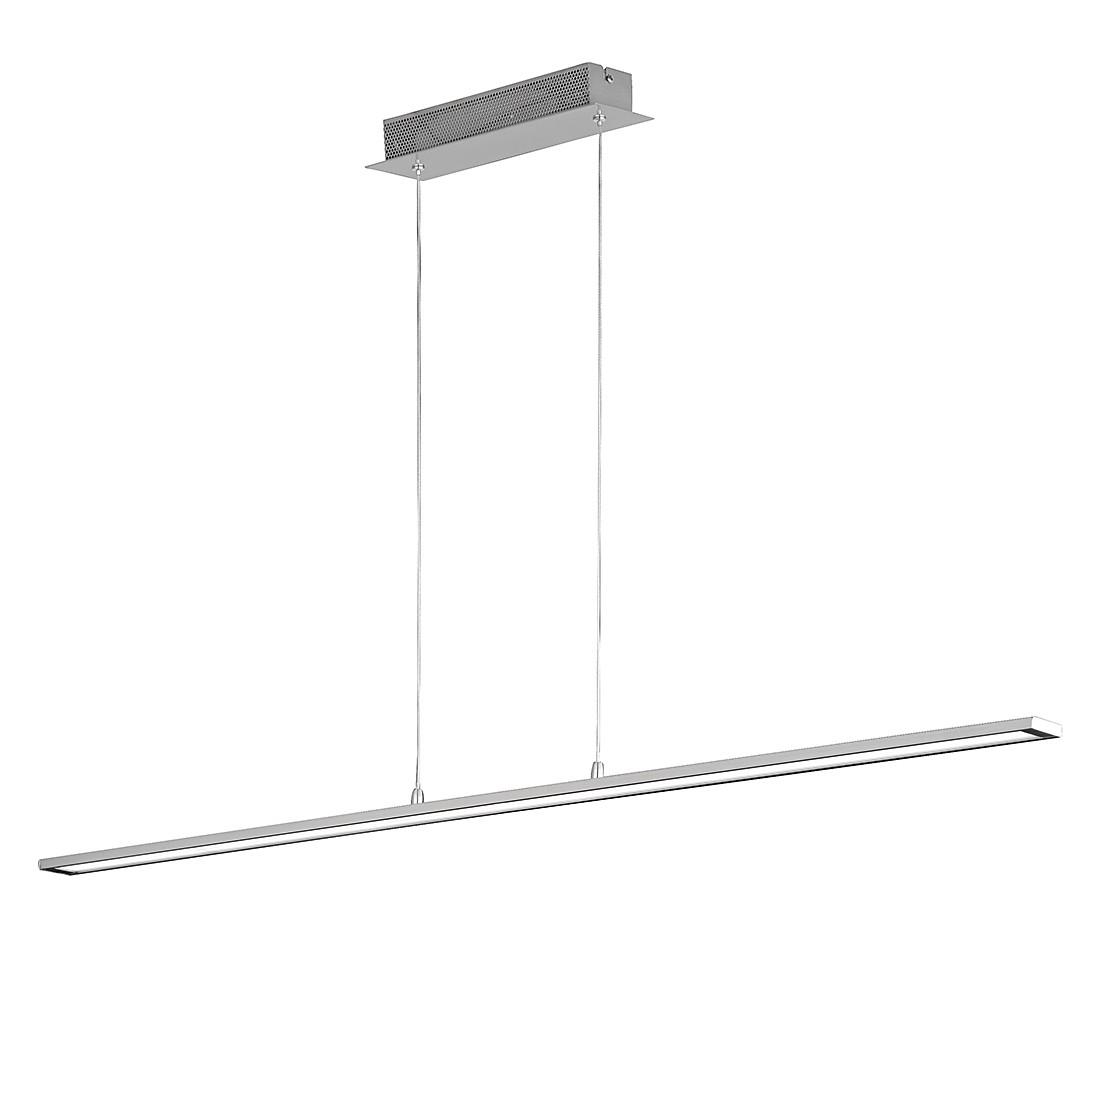 EEK A+, Pendelleuchte LUZ – Metall/Kunststoff – 1-flammig, Wofi online bestellen